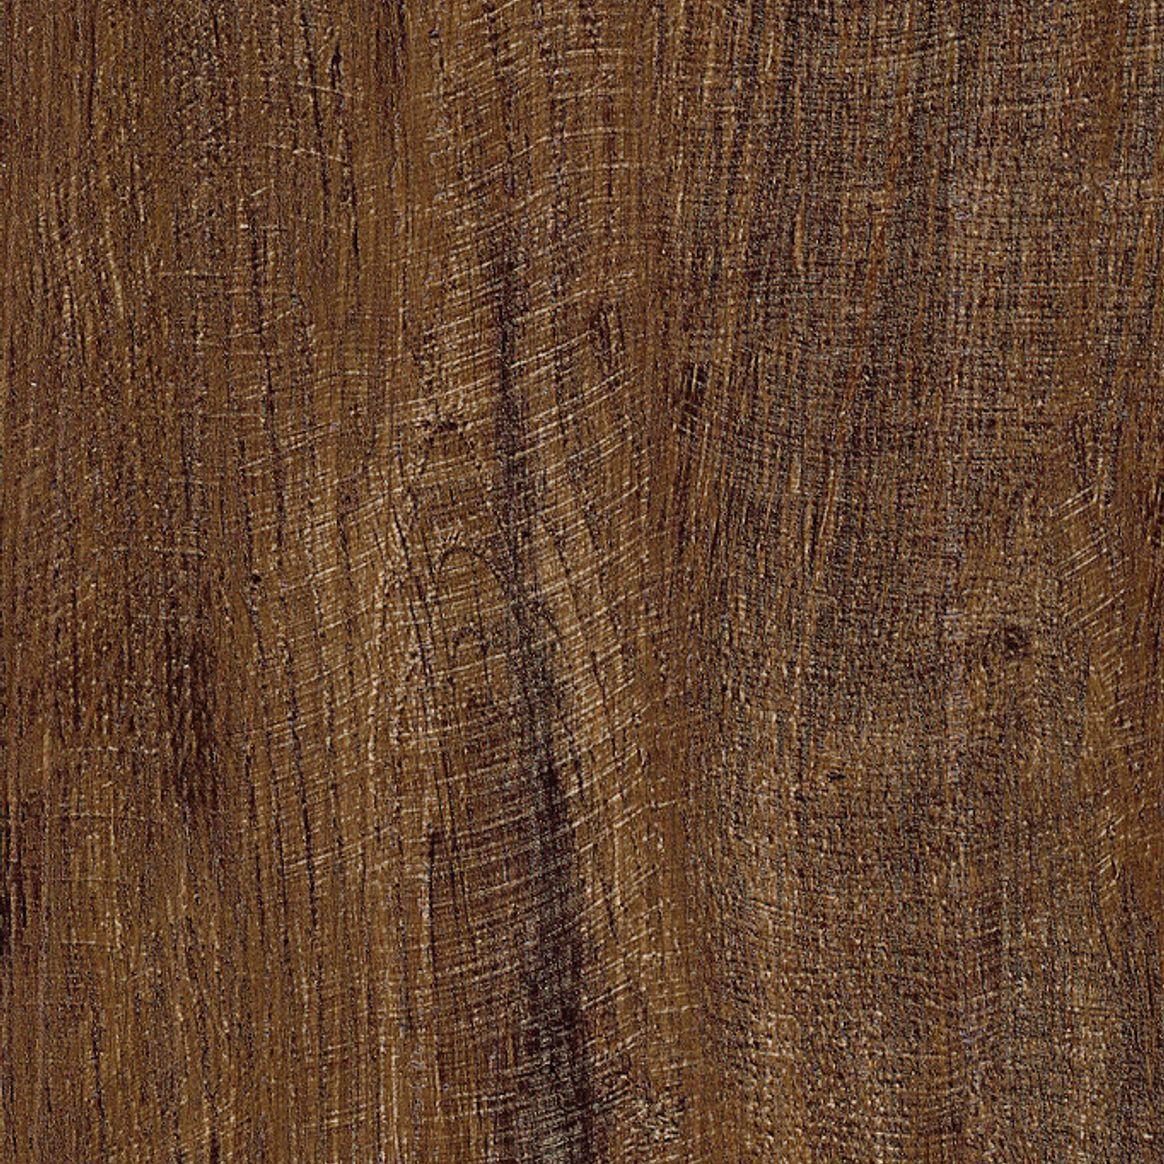 Rustic Barn Wood tile